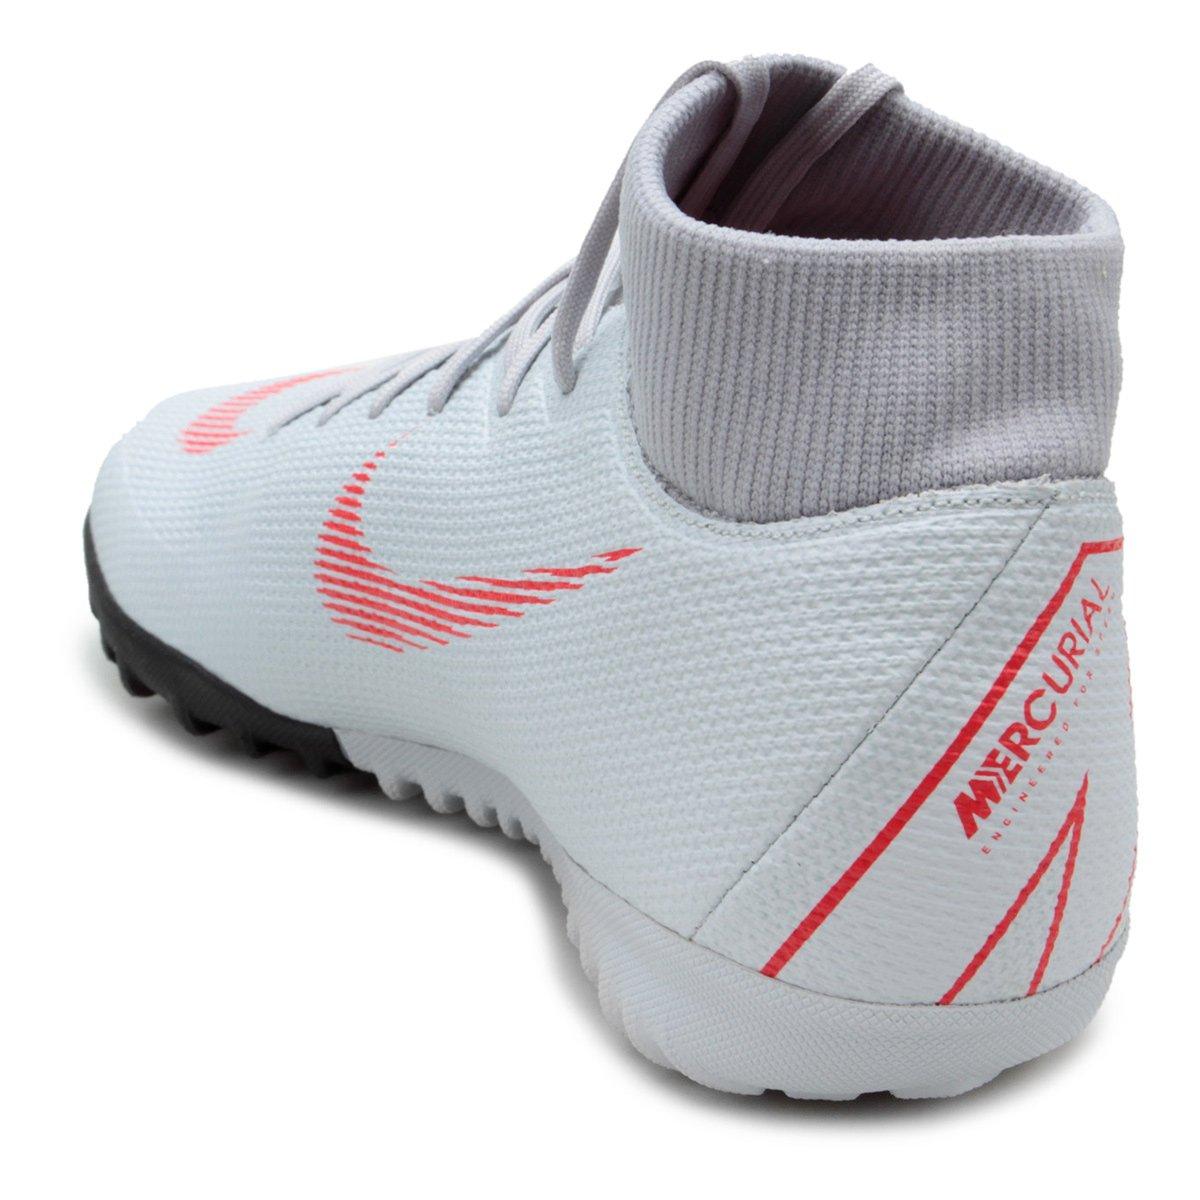 c2fb6cb556 Chuteira Society Nike Mercurial Superfly 6 Academy - Cinza - Compre ...